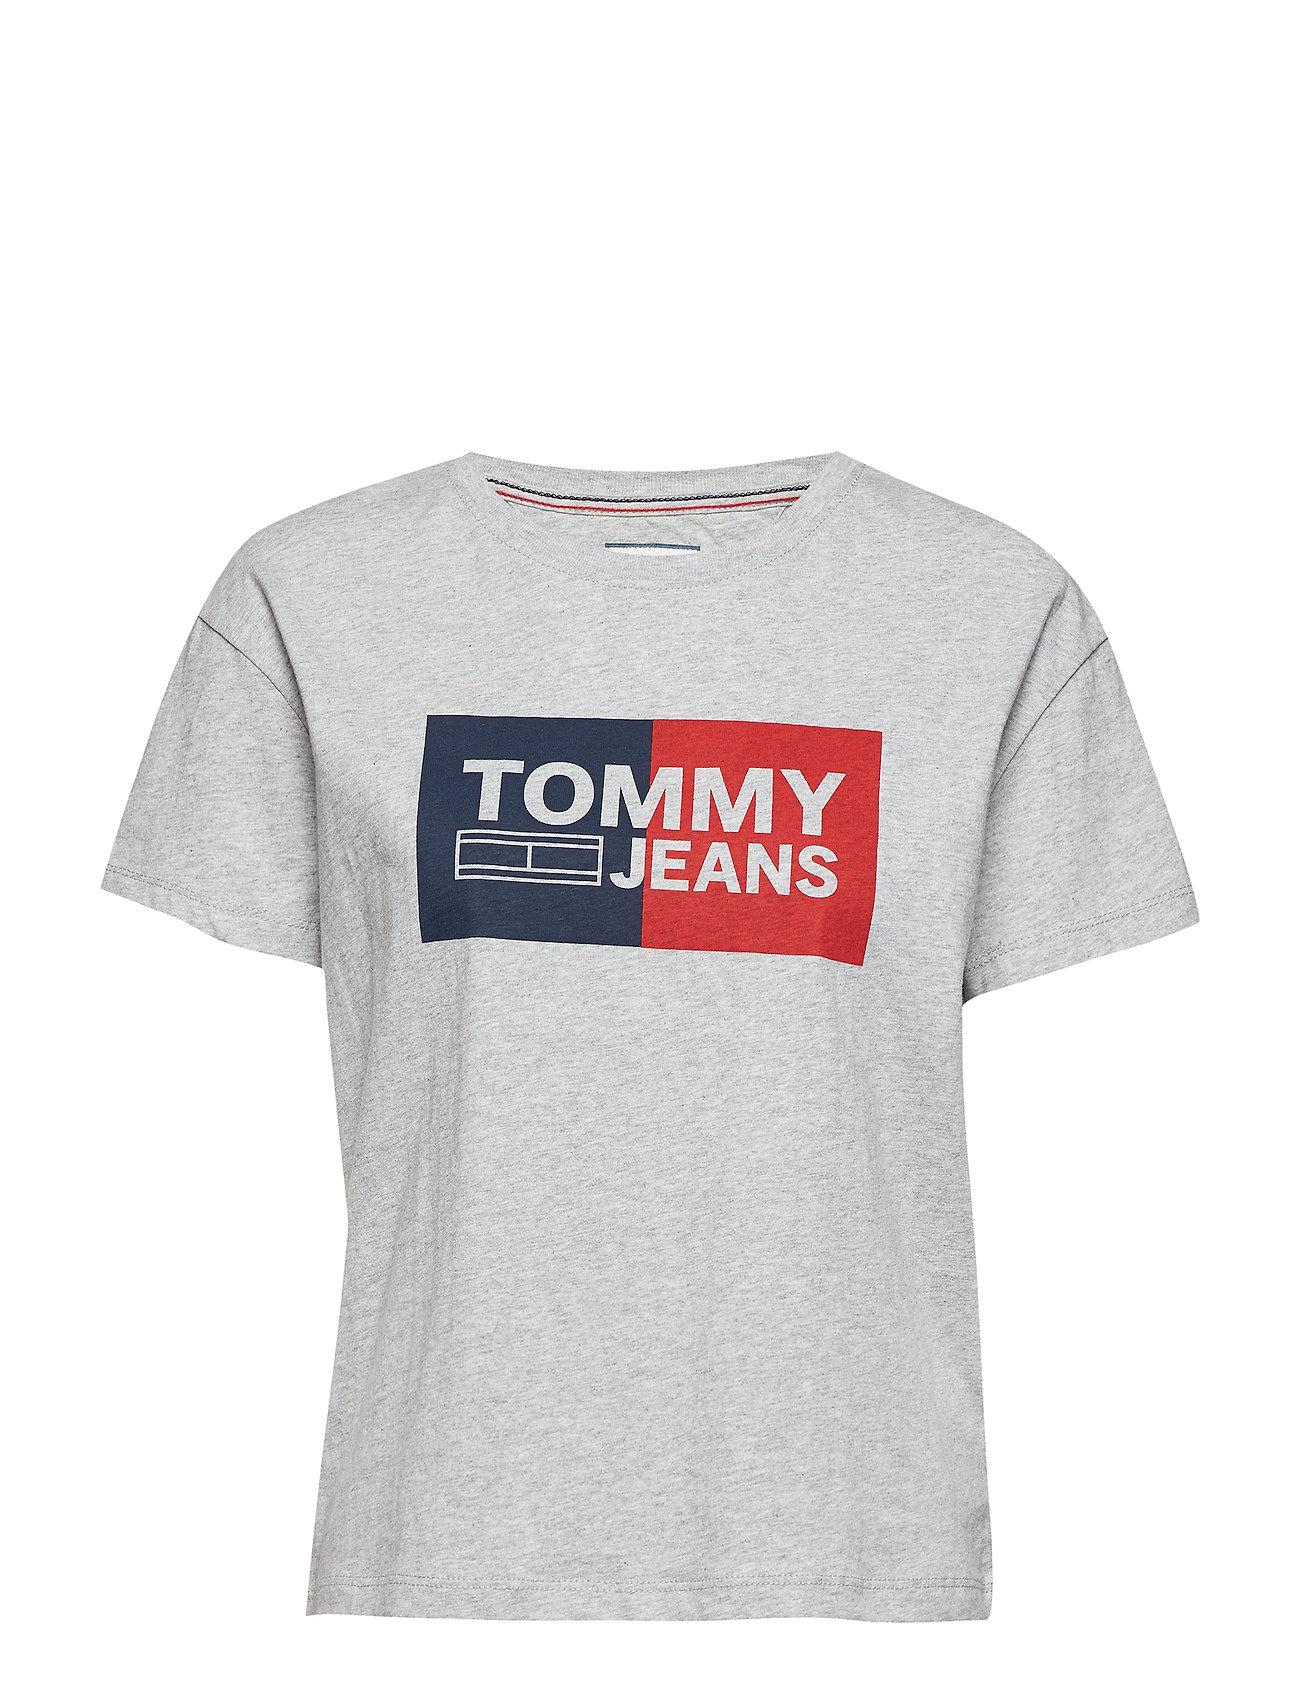 Tommy Jeans TJW BOX LOGO TEE, 00